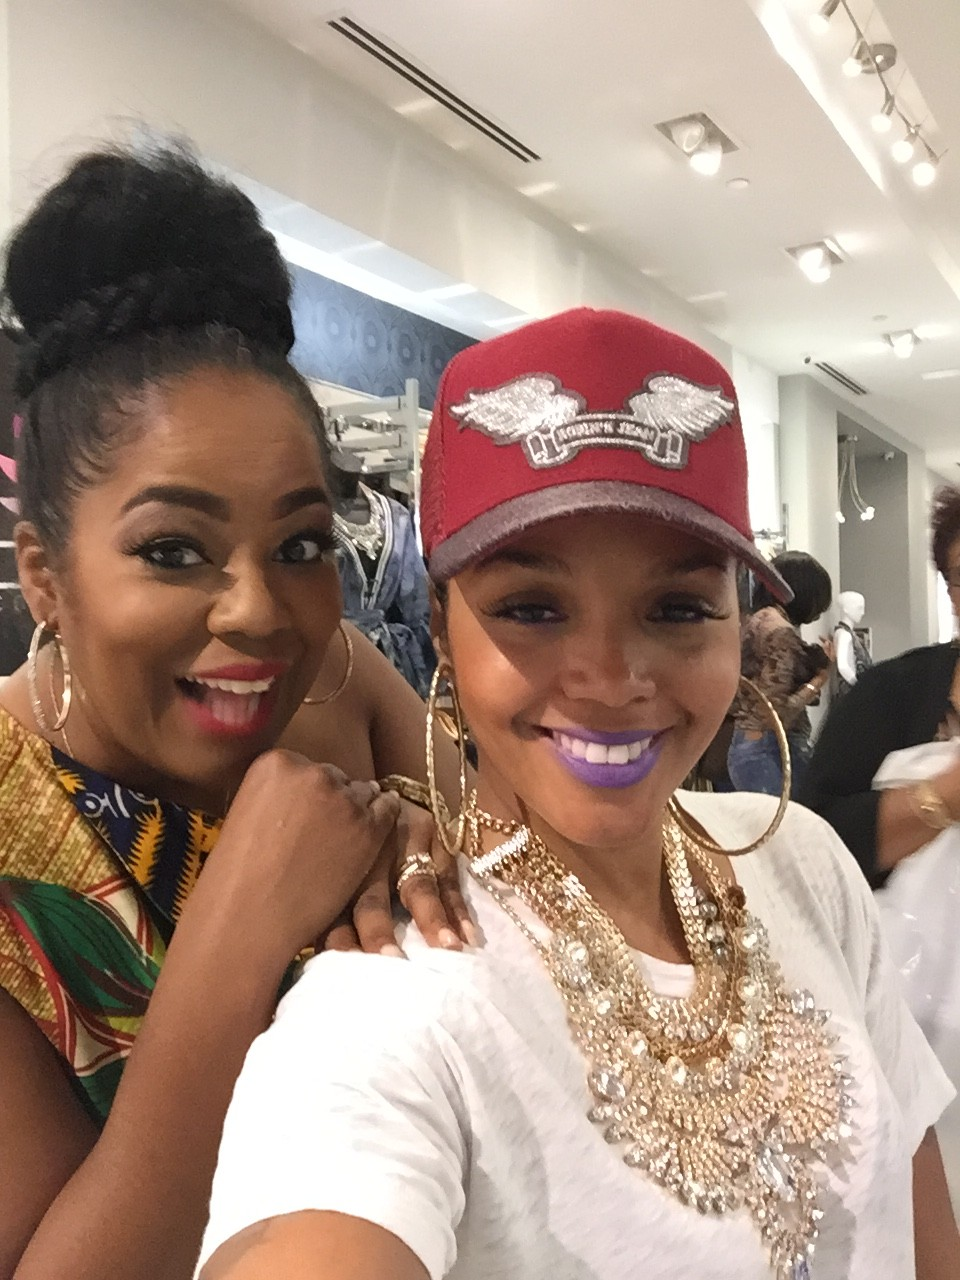 Peek Inside: Love & Hip Hop Atlanta's Reality Star Rasheeda's 'Pressed' Boutique